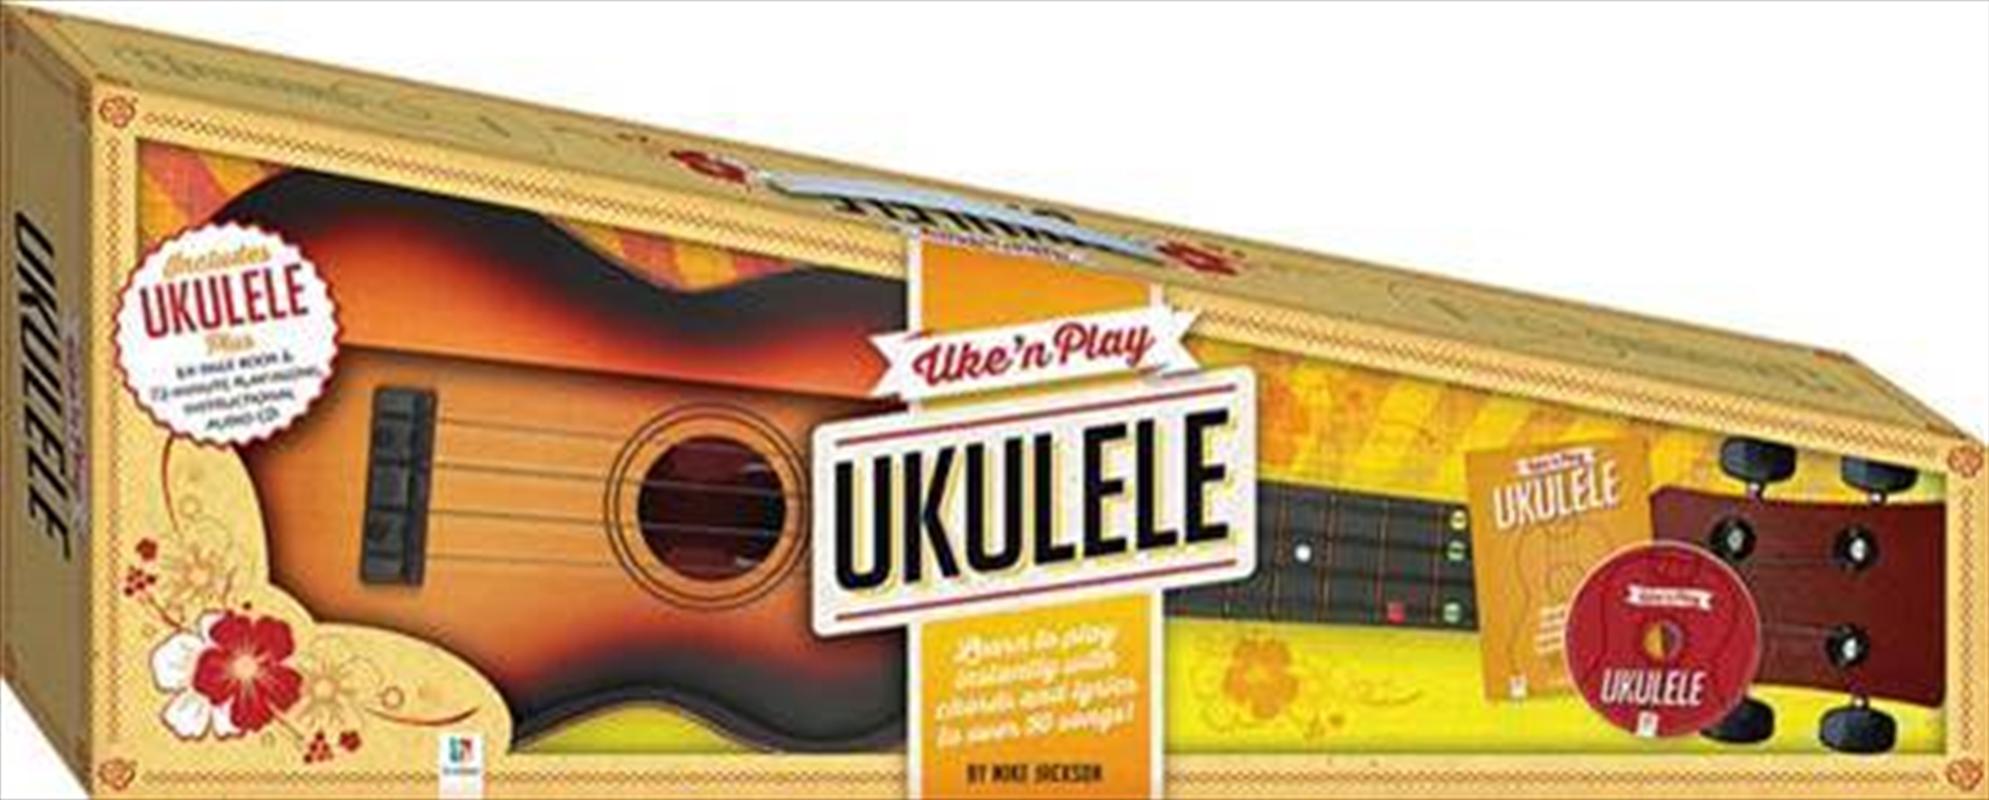 Ukulele - Uke'n Play | Merchandise